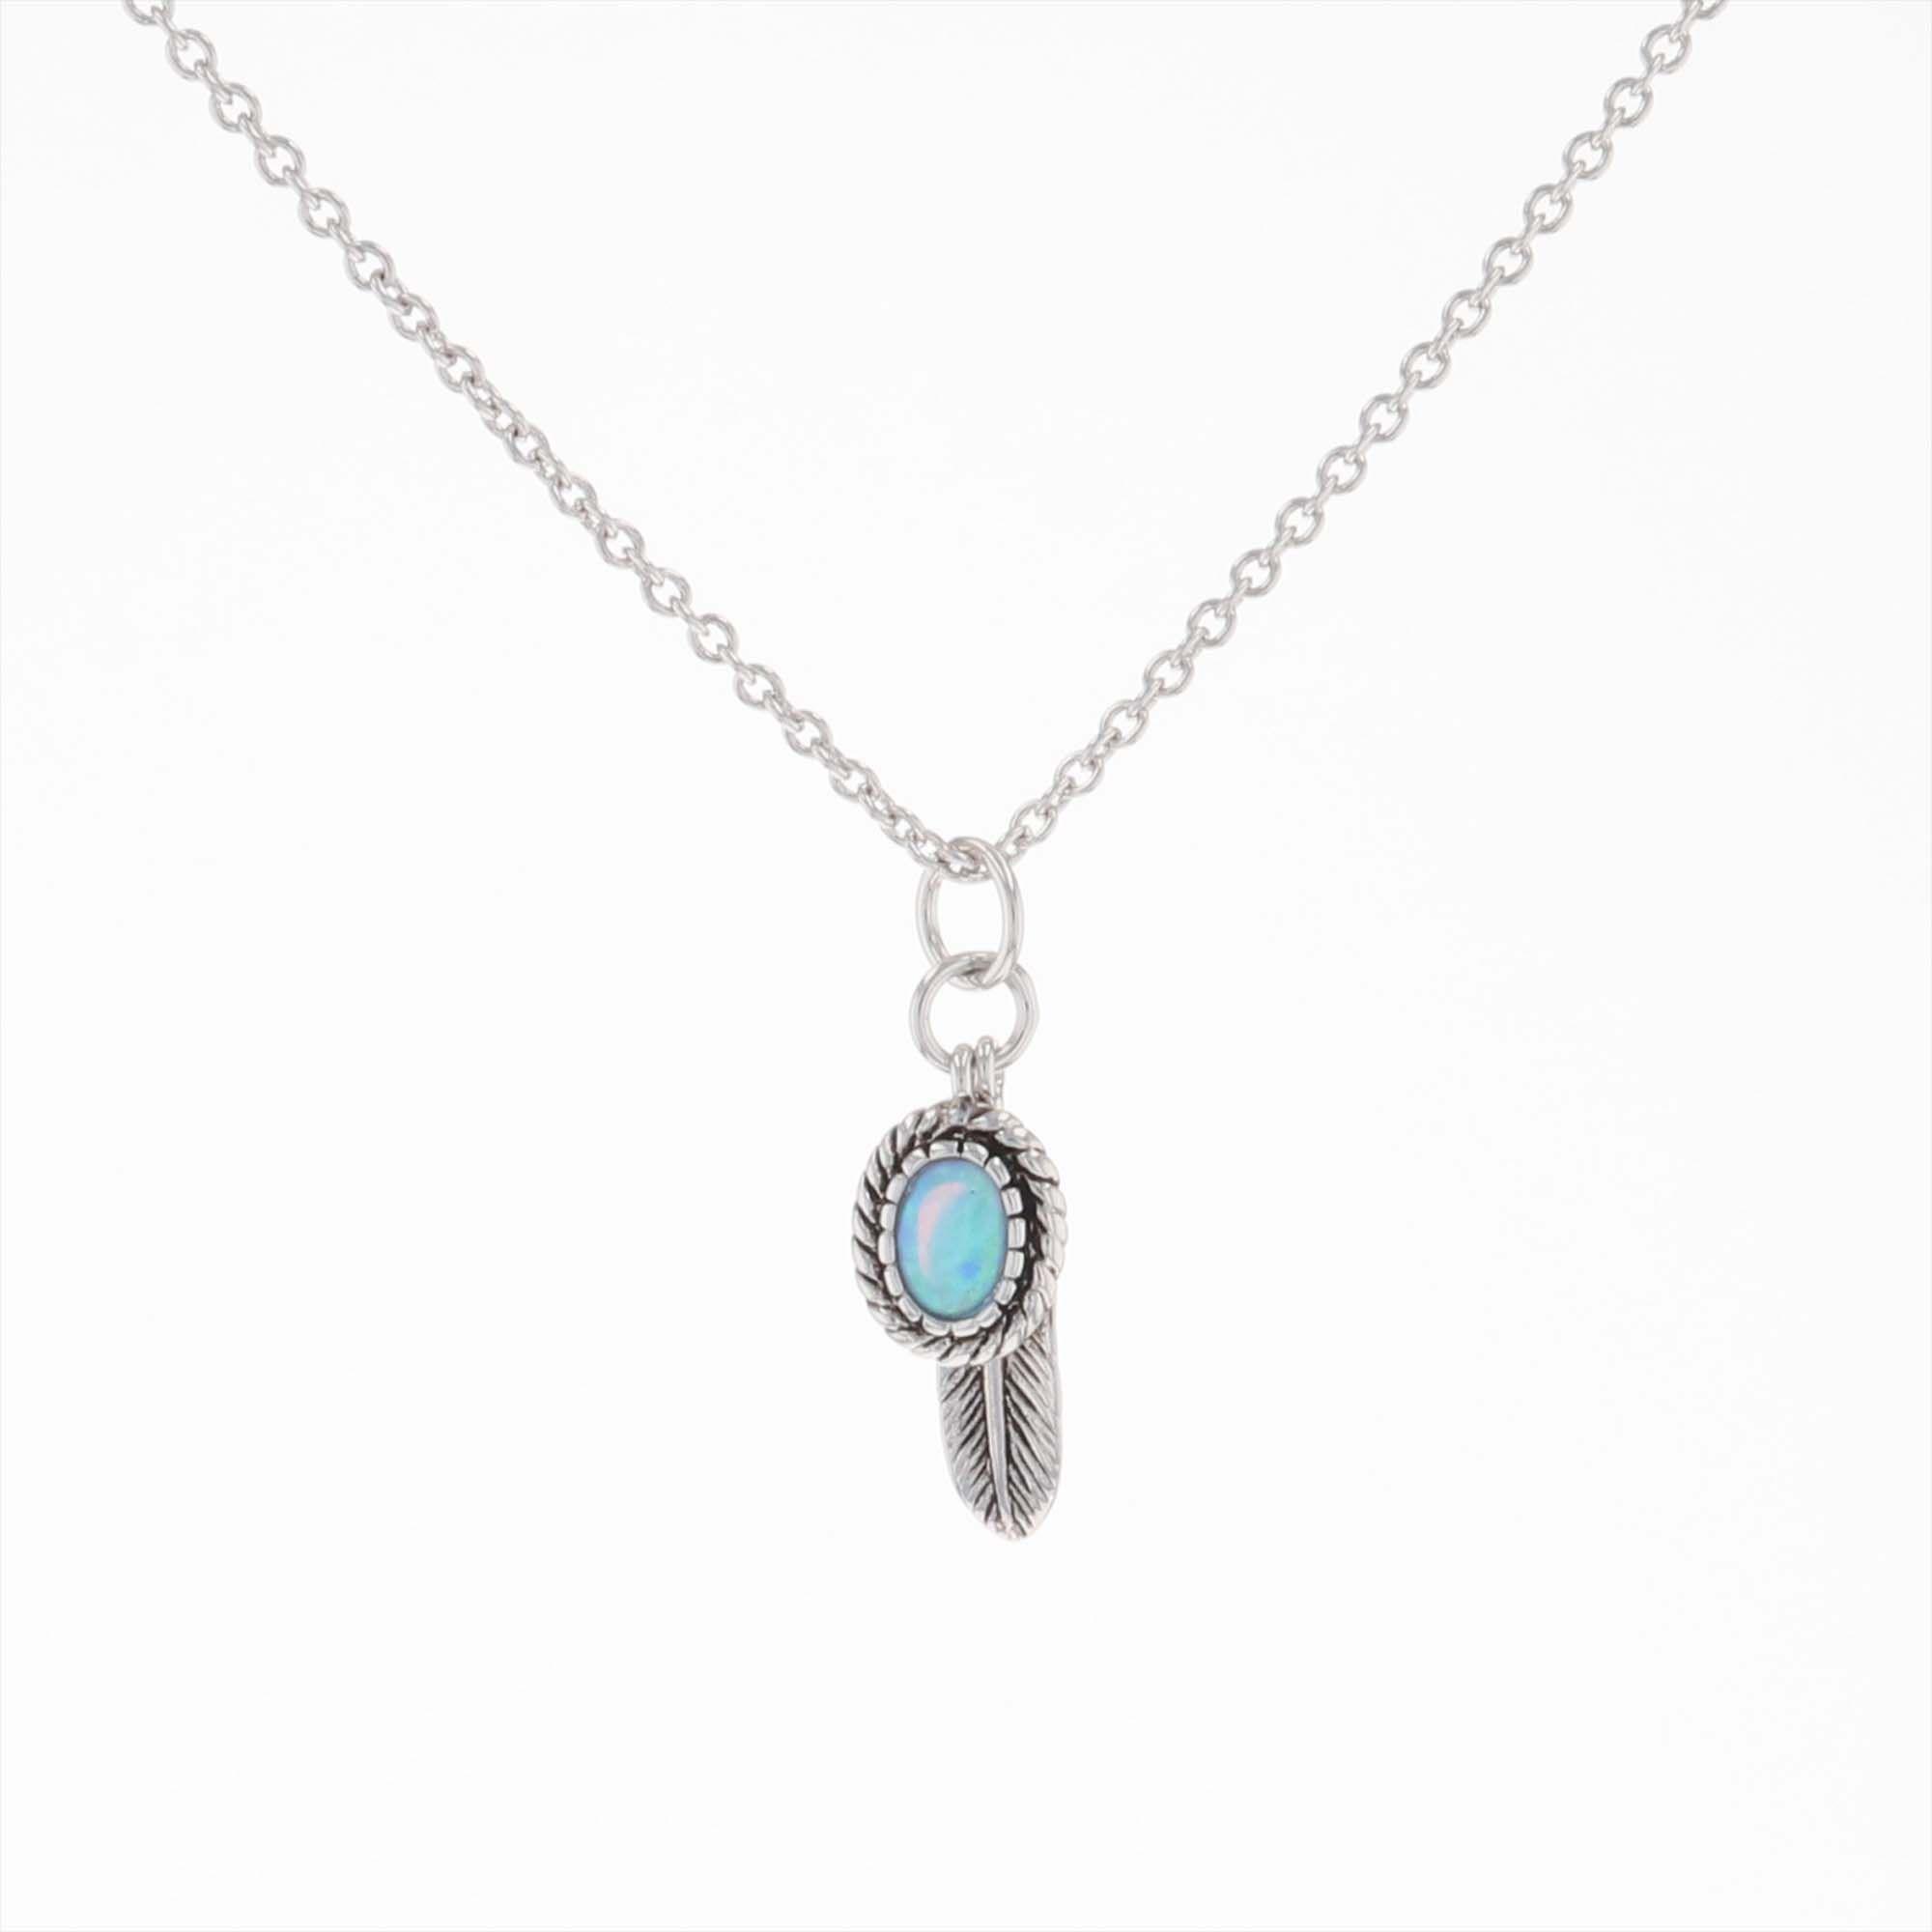 Wishing On Hope Opal Necklace